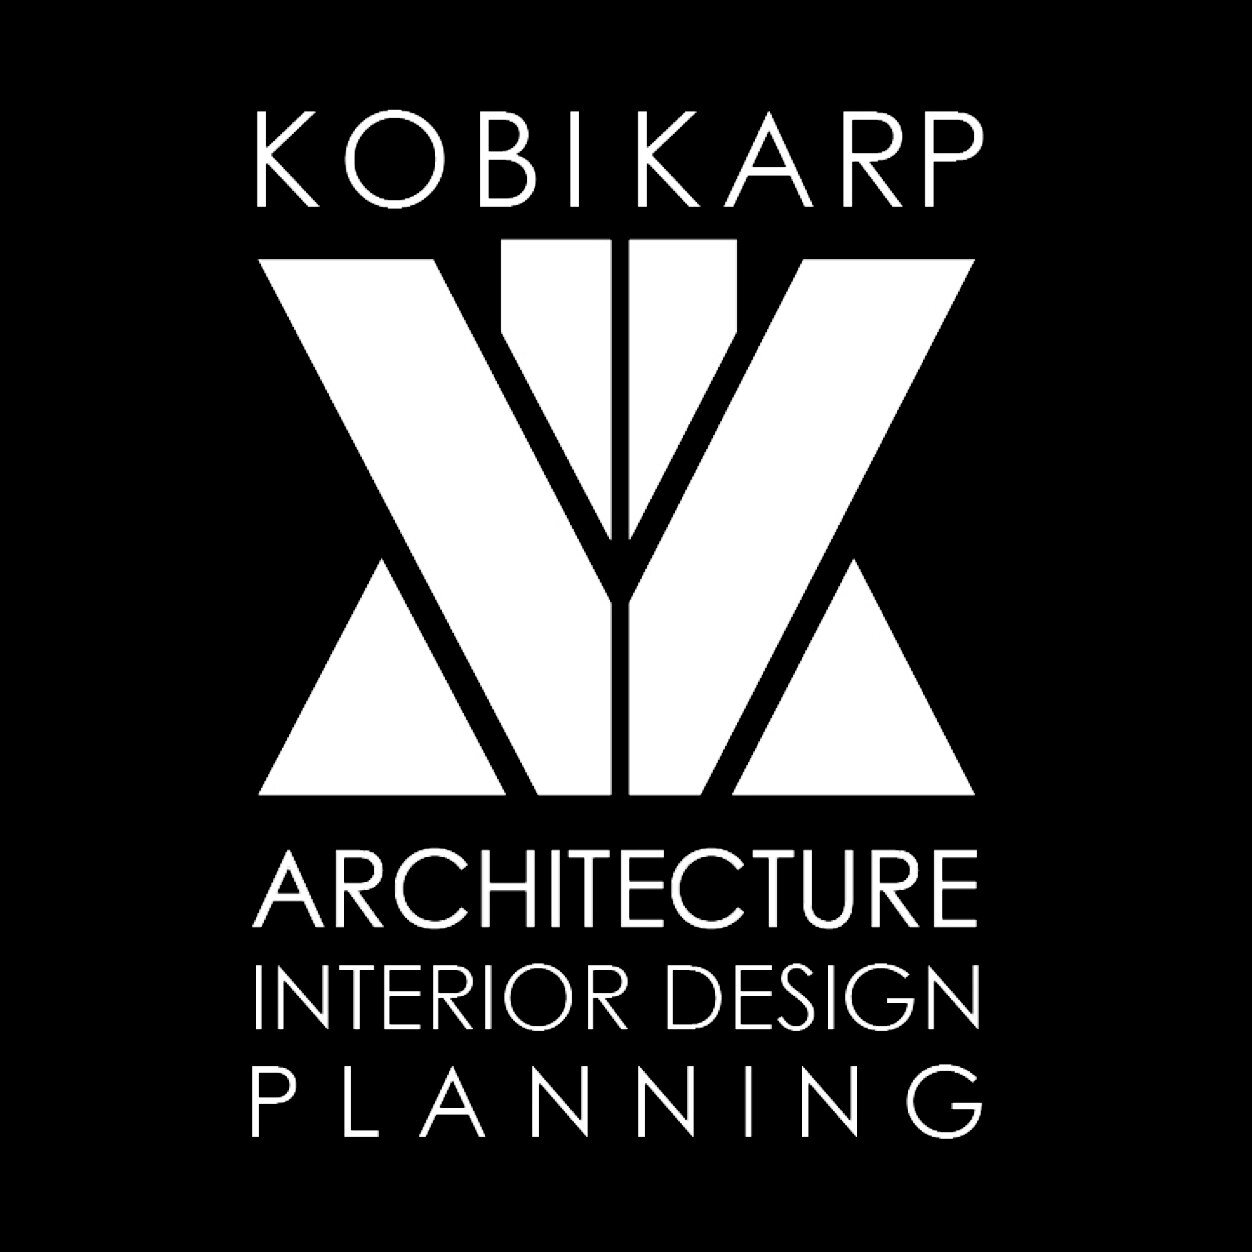 Kobi Karp Architecture & Interior Design, Inc.